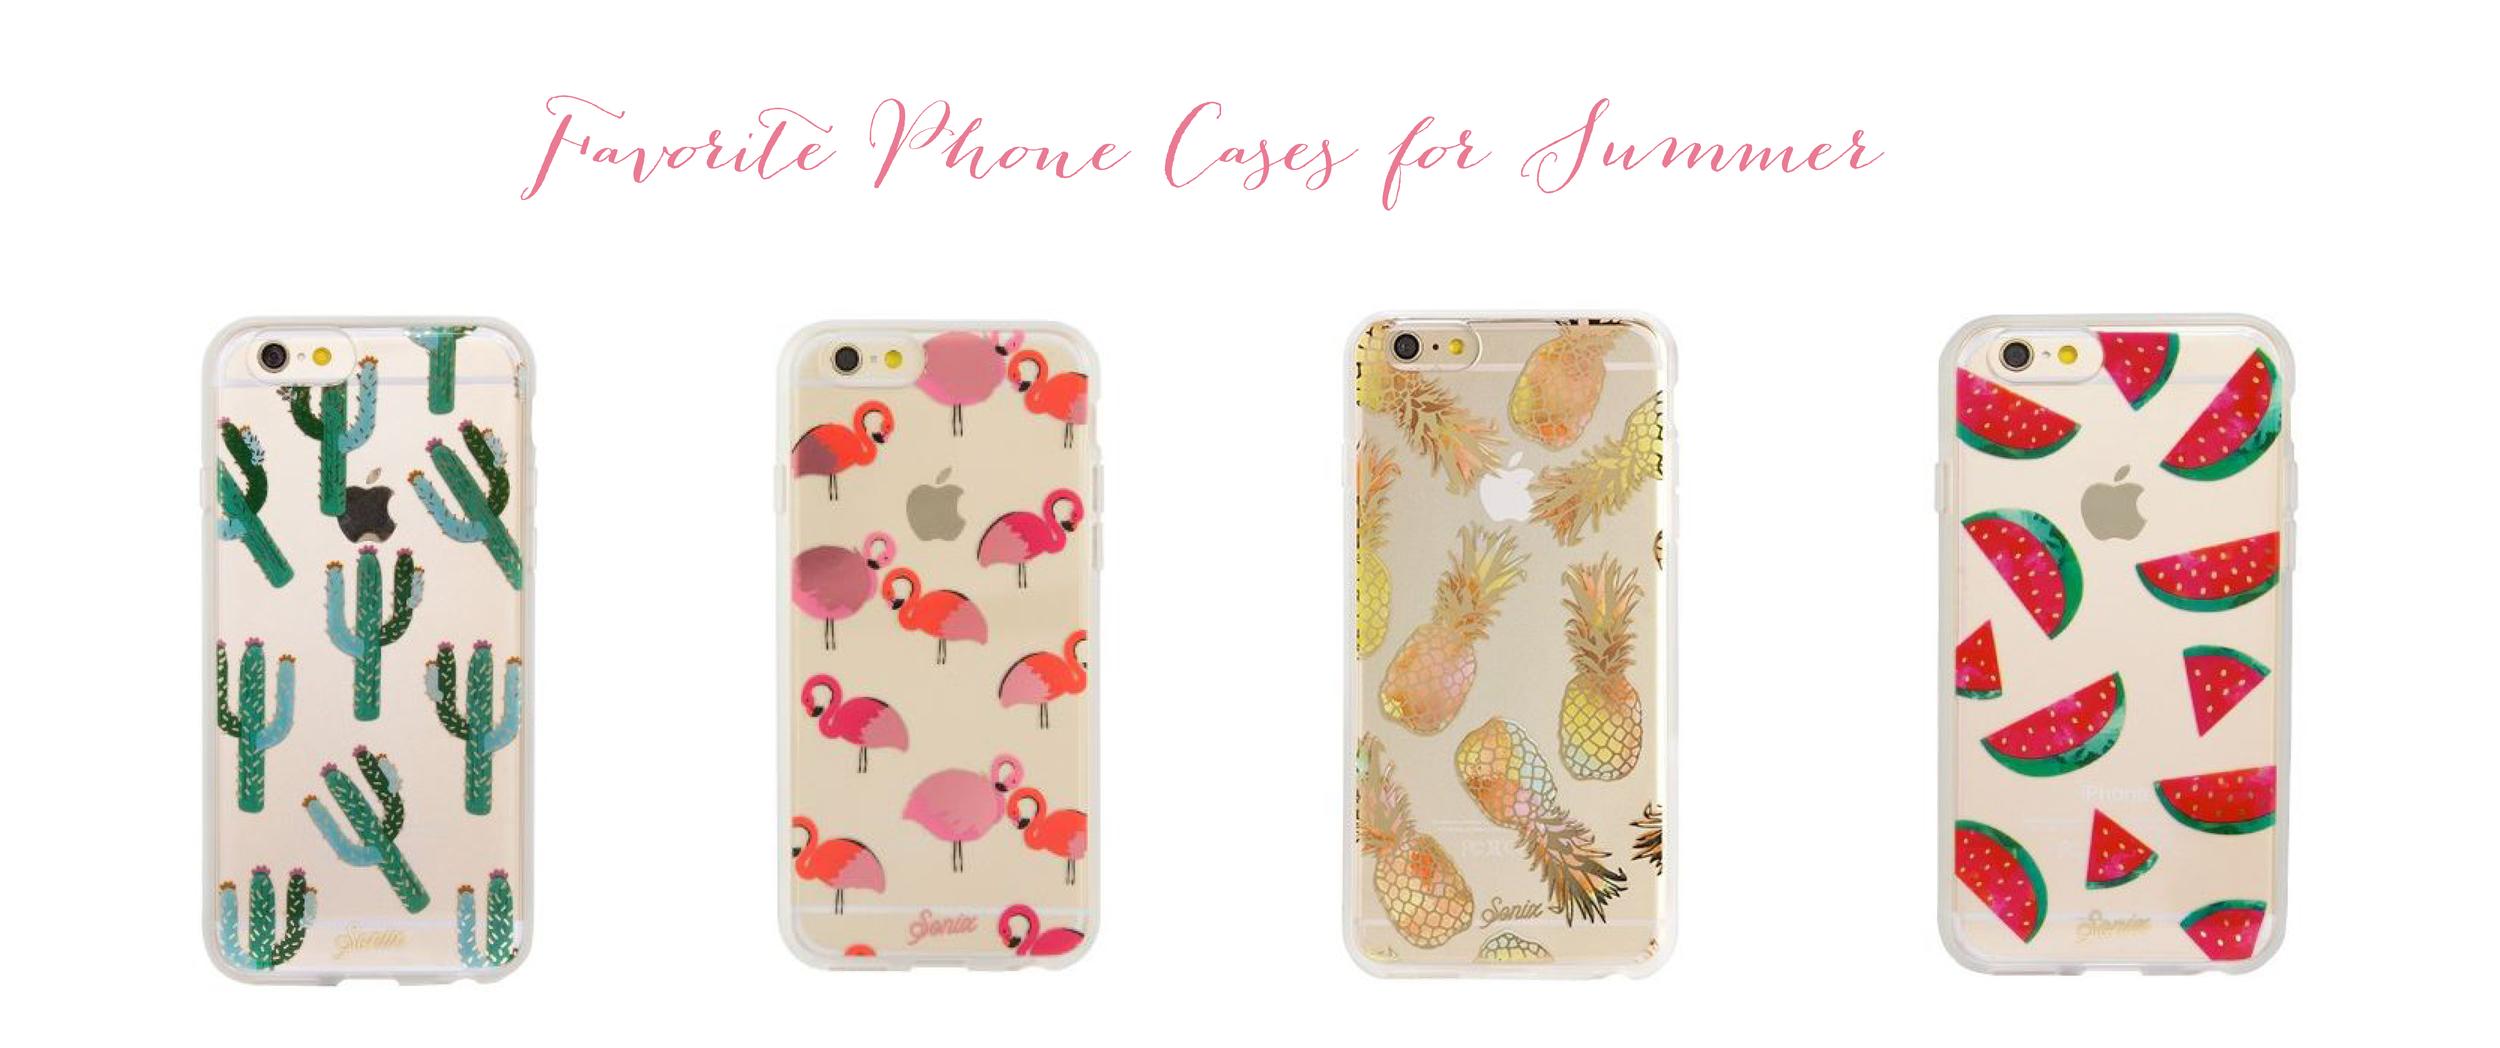 Click links to shop:  cactus ,  flamingo ,  pineapple ,  watermelon